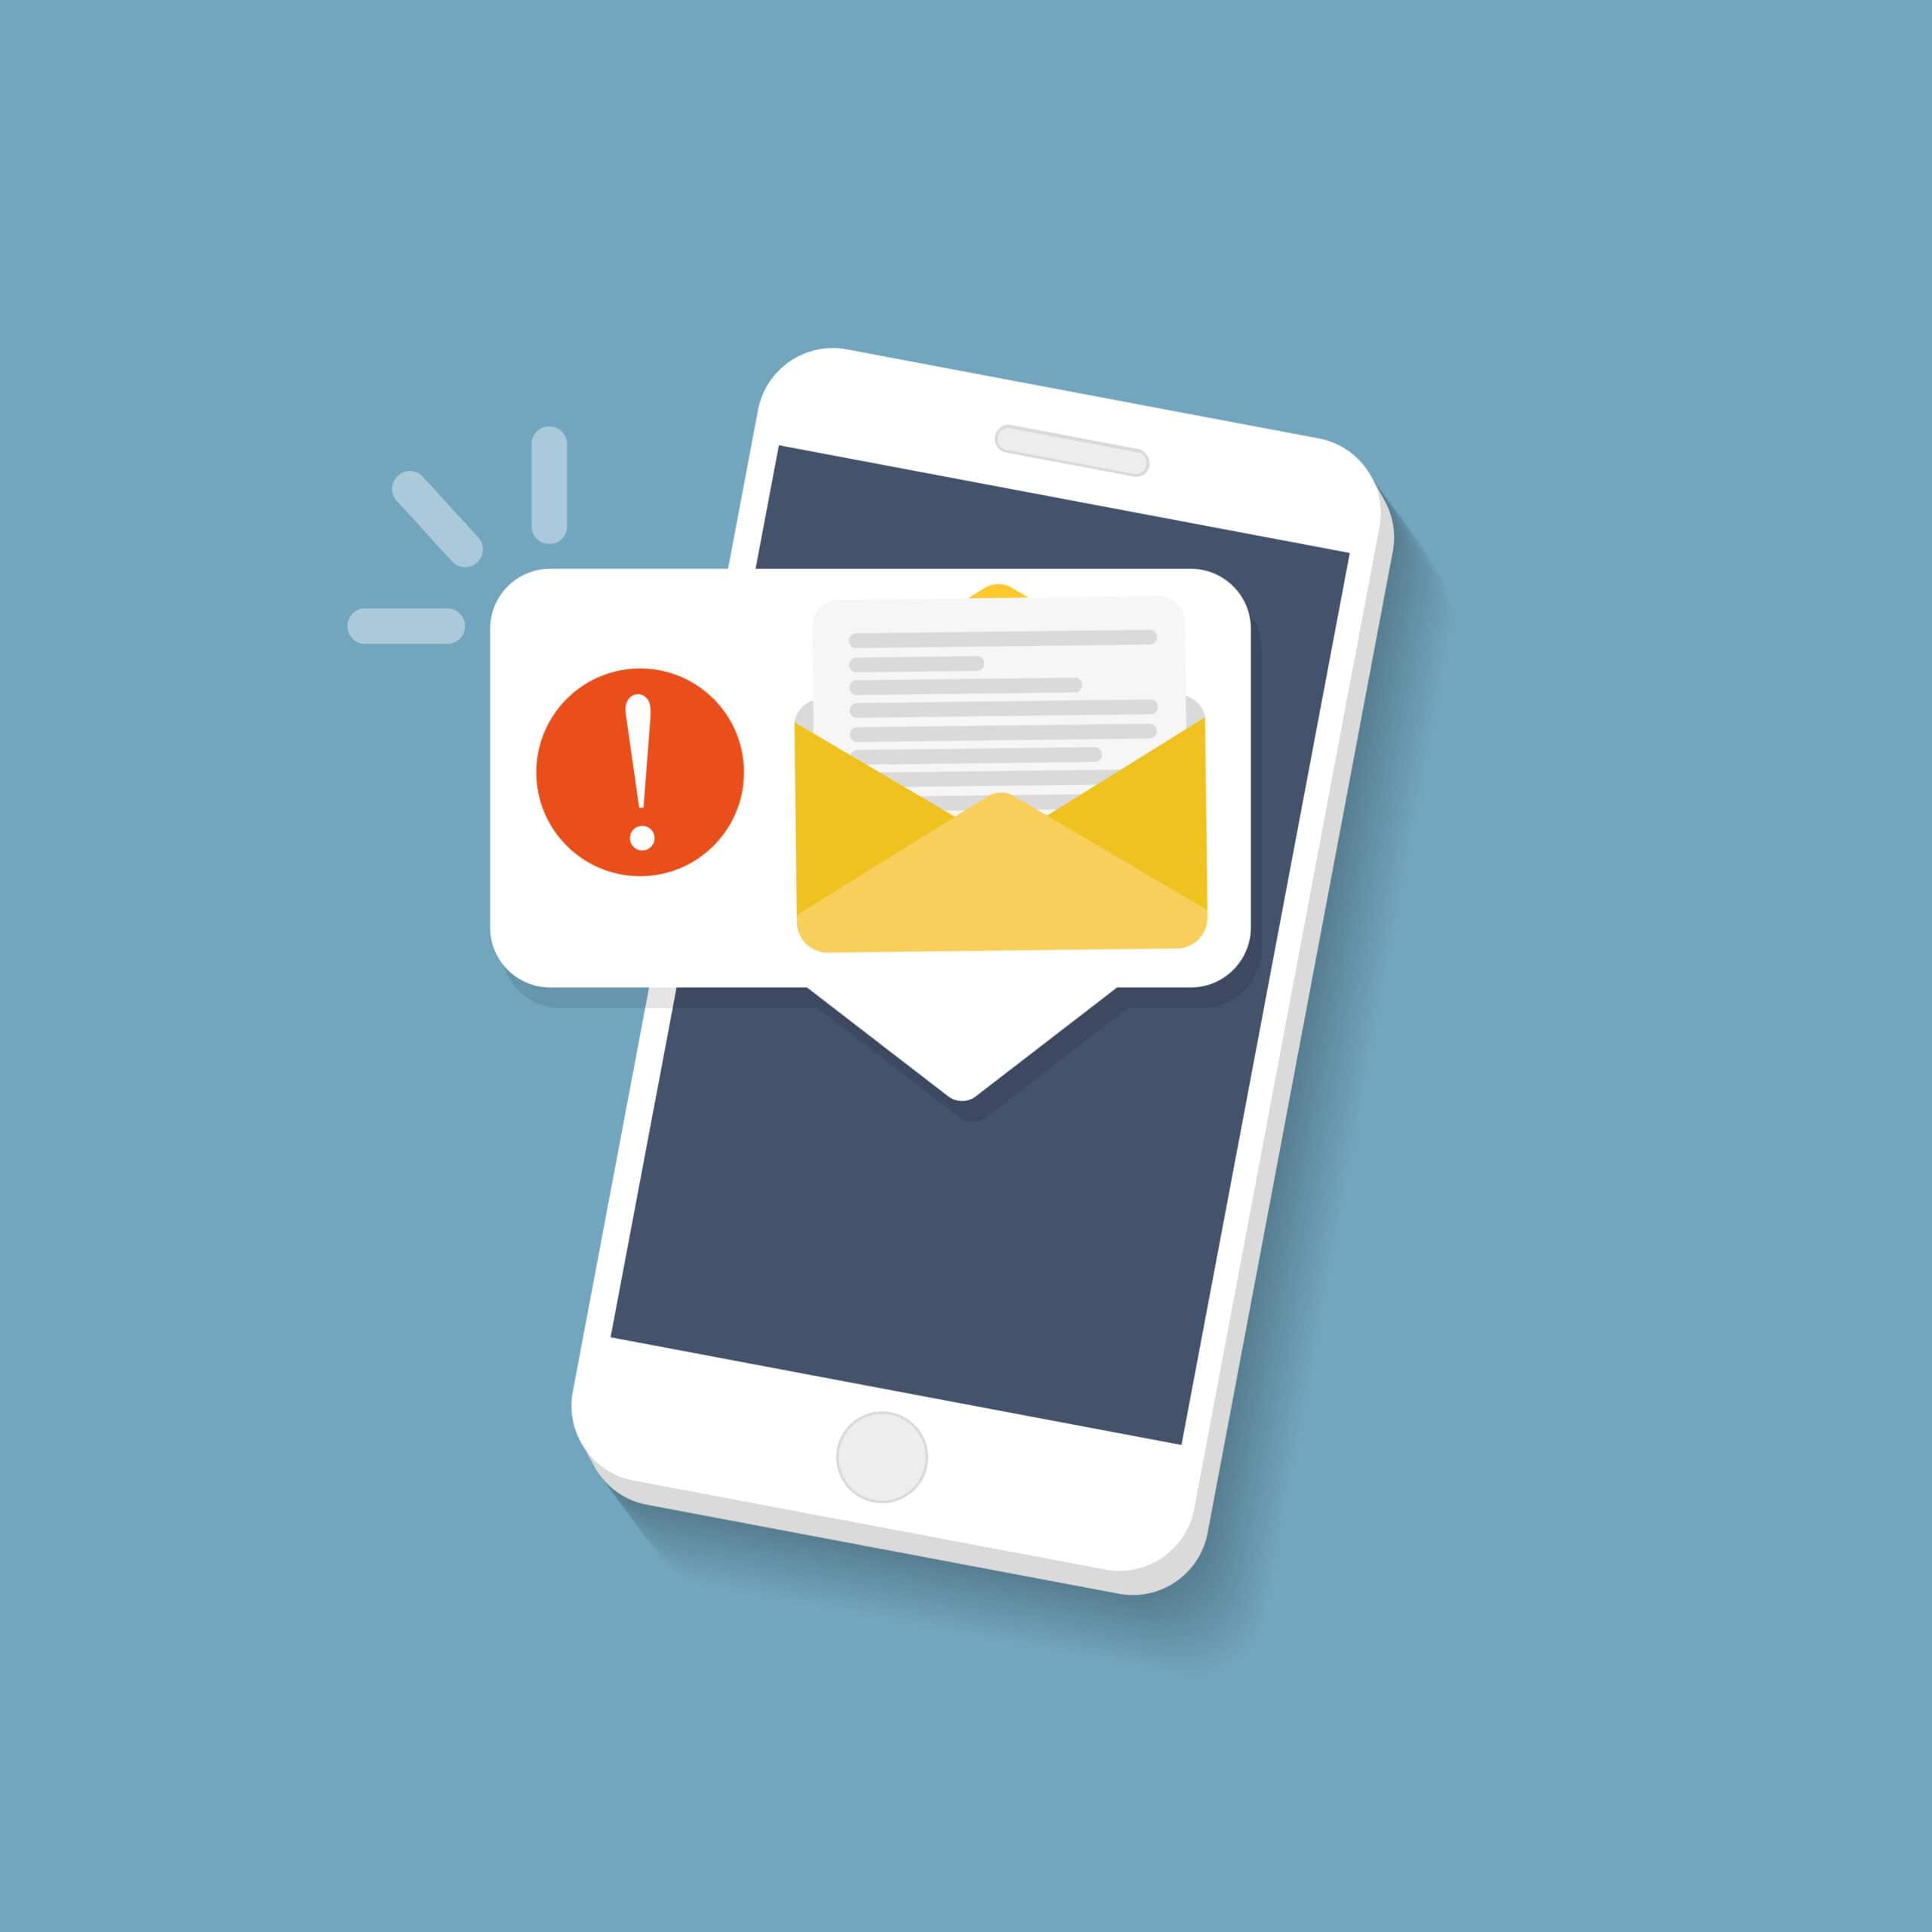 set uproar reminder emails today Downey Insurance group